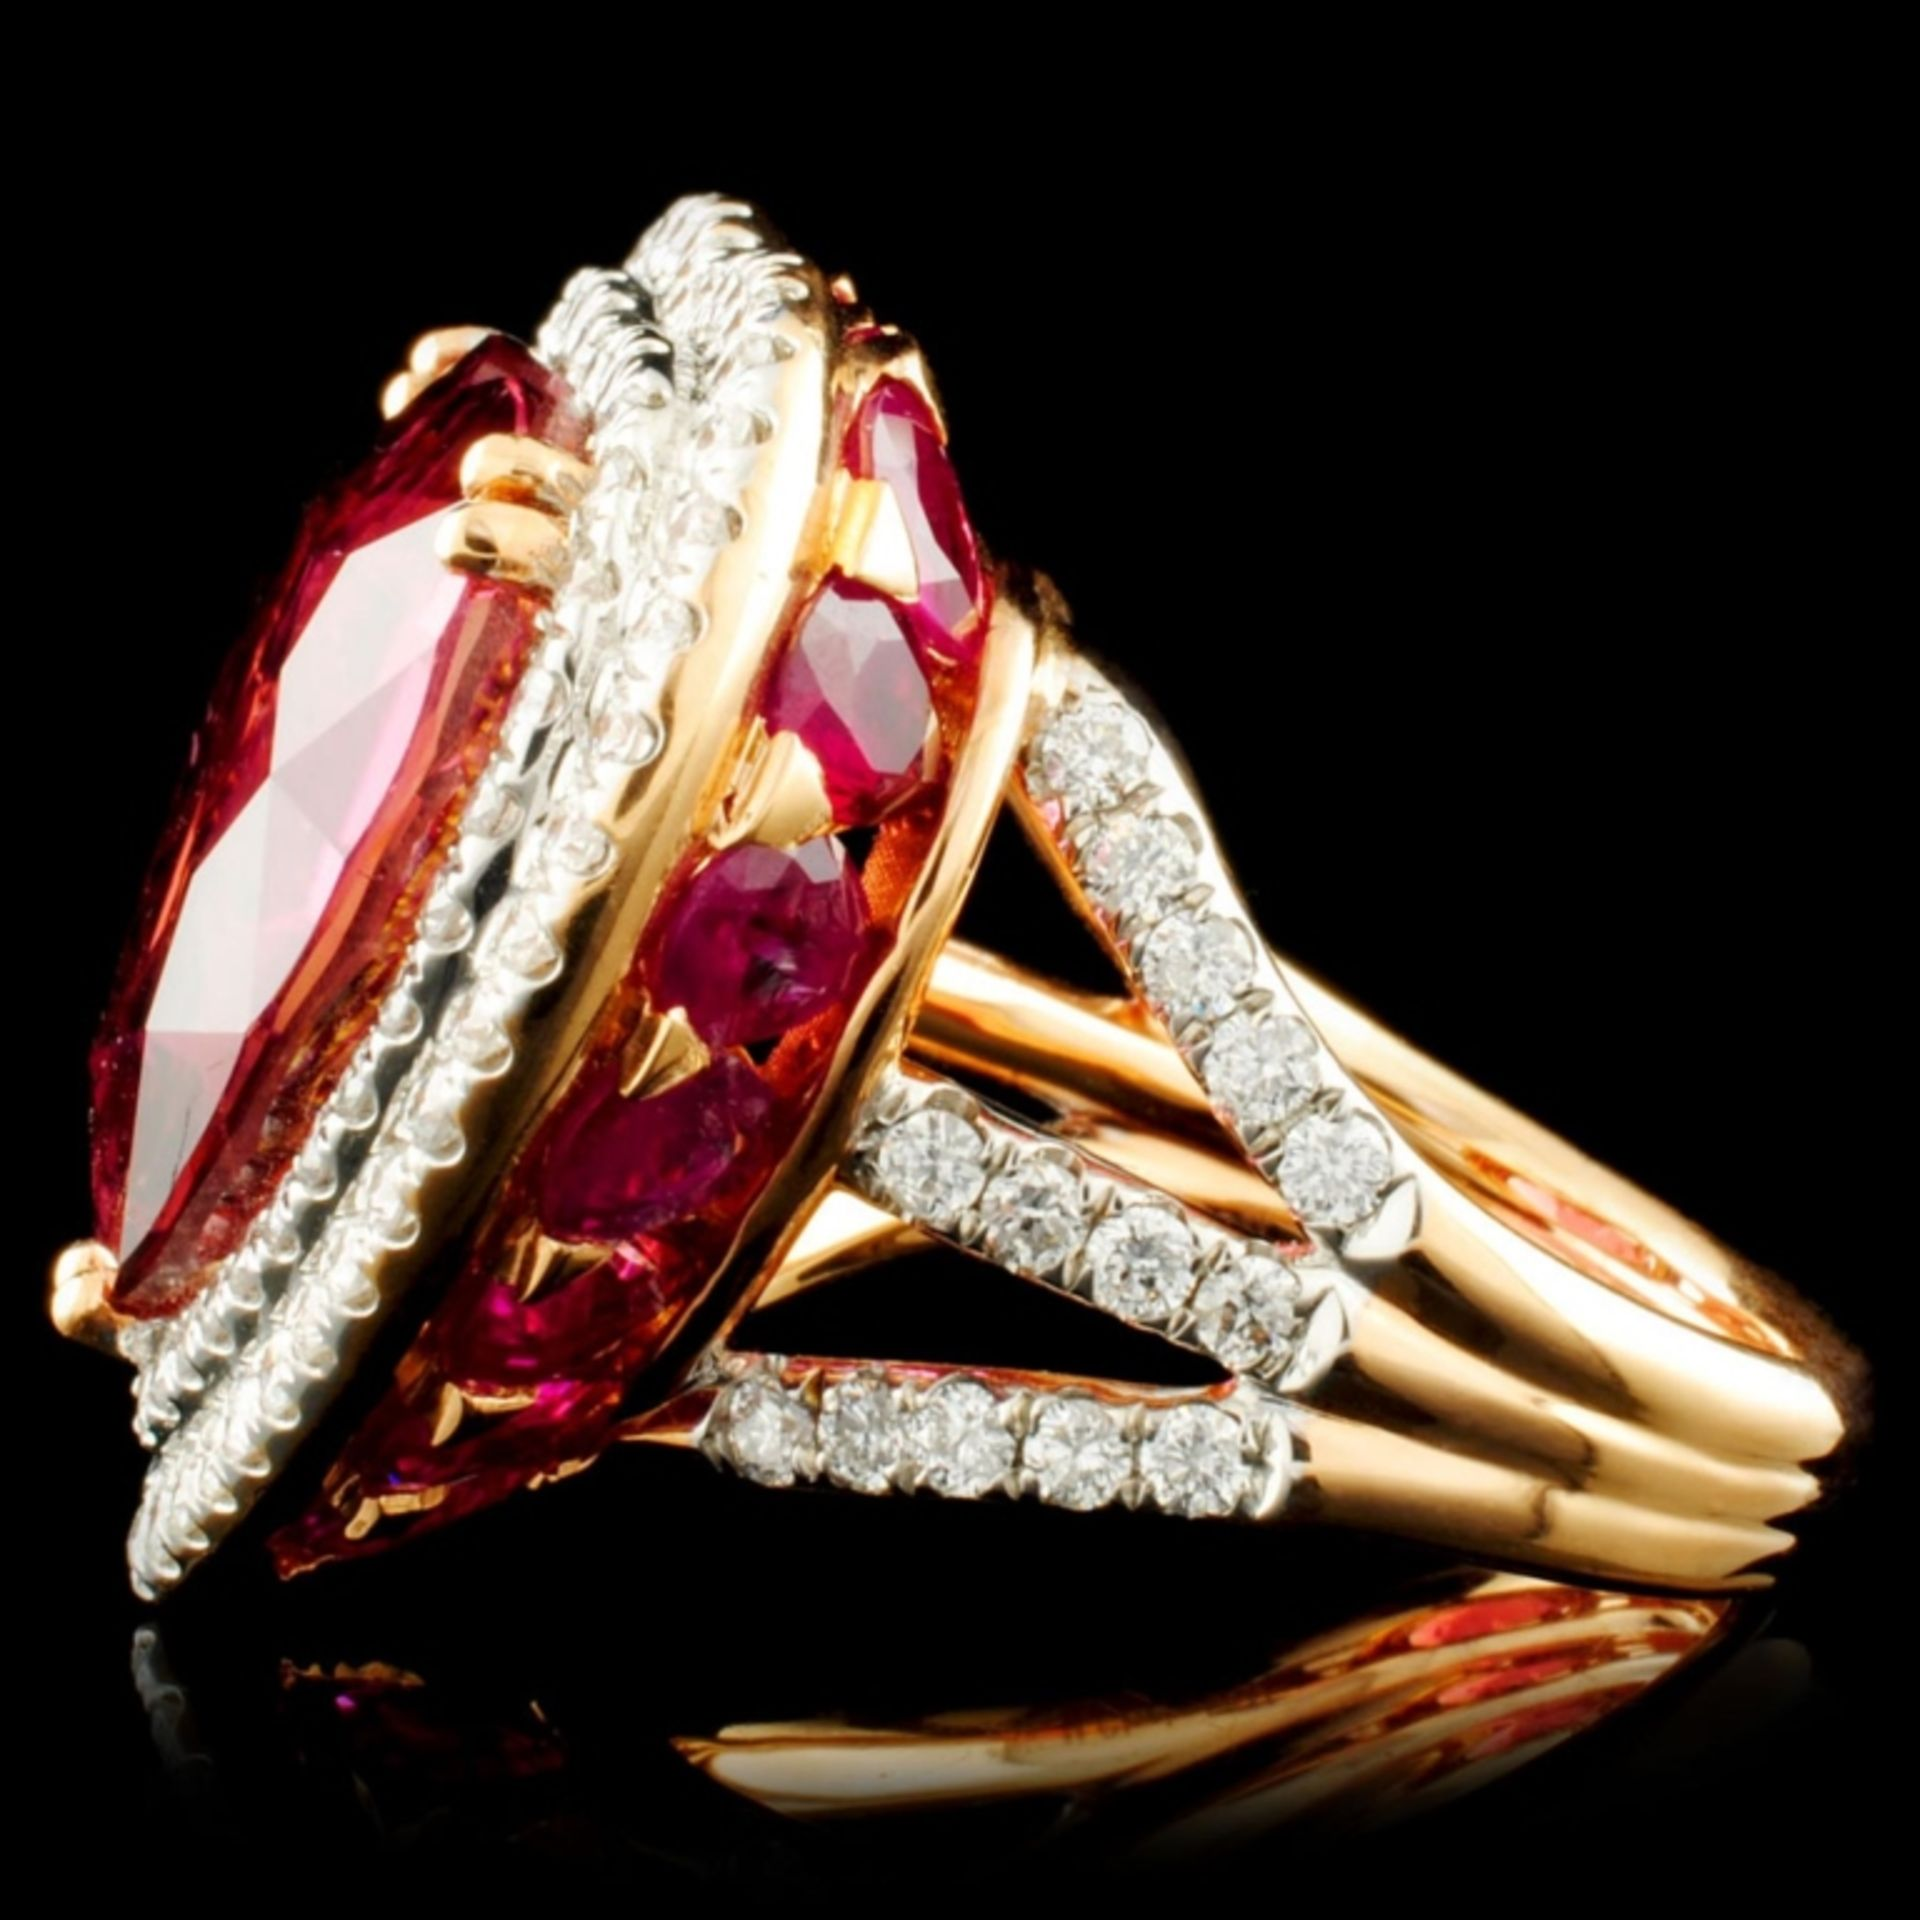 18K Gold 16.47ct Rubellite & 1.76ctw Diamond Ring - Image 5 of 6